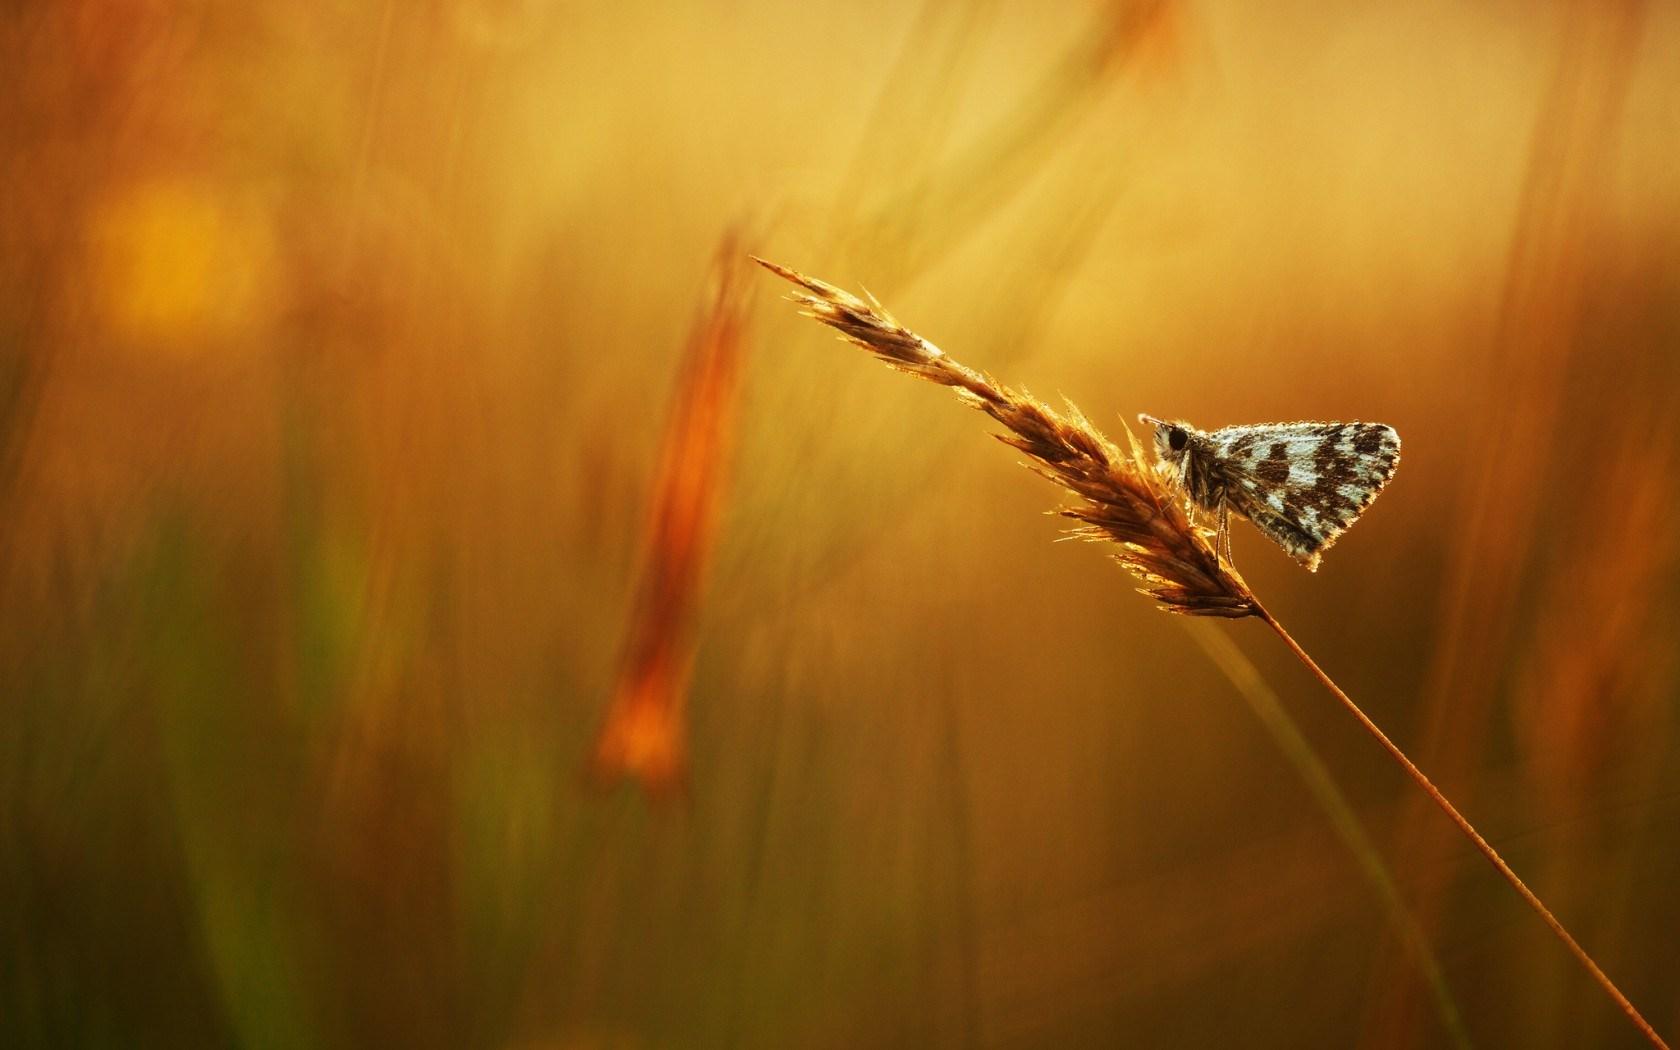 Butterfly Grass Dew Drops